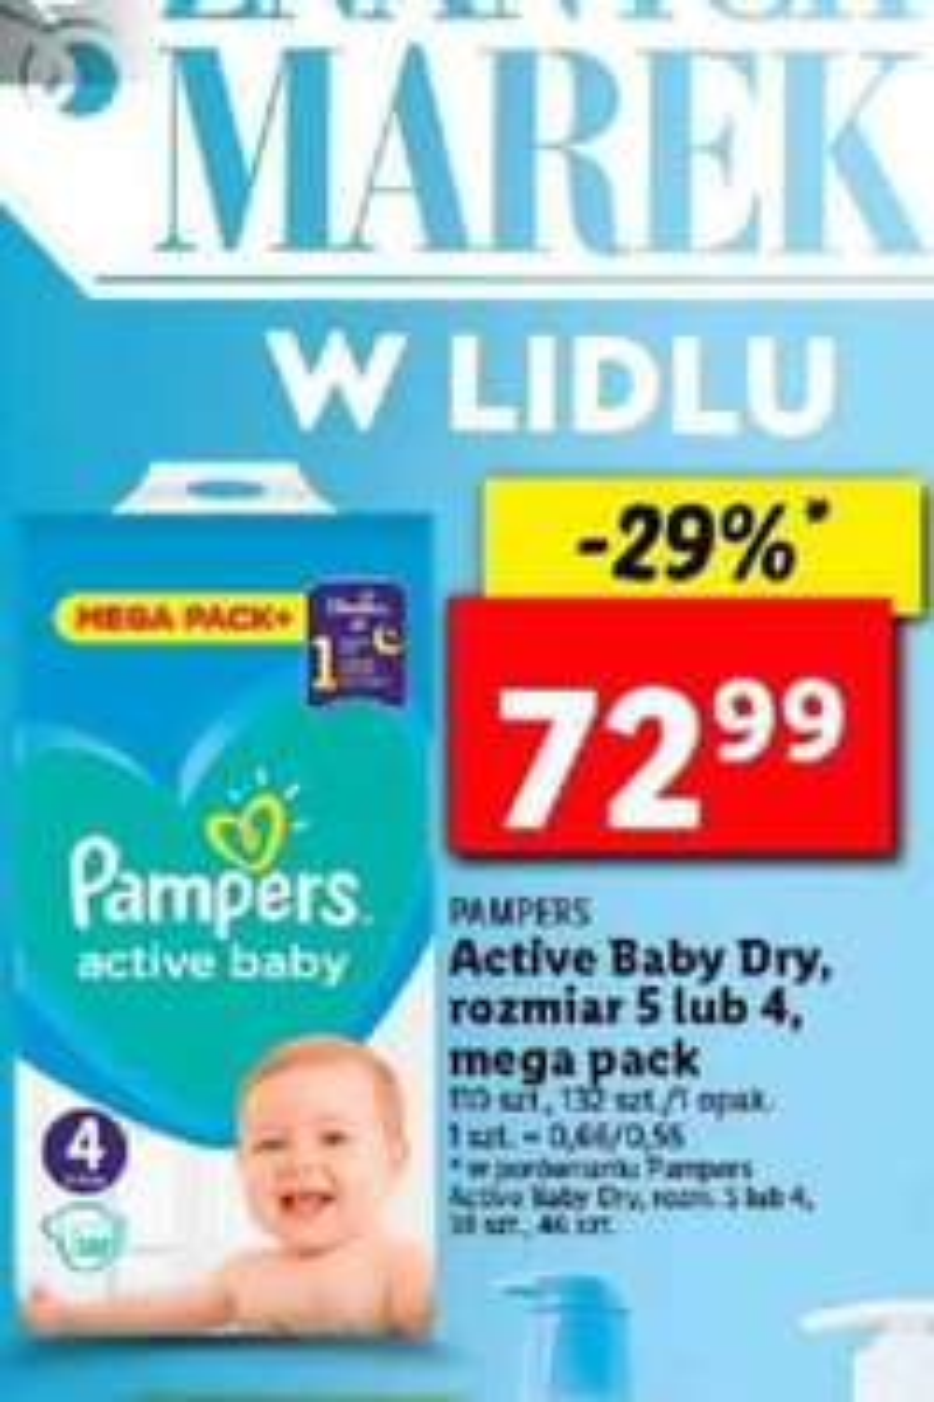 Pampers Active Baby Dry 4 i 5 paczka 132 szt. w LIDL-u